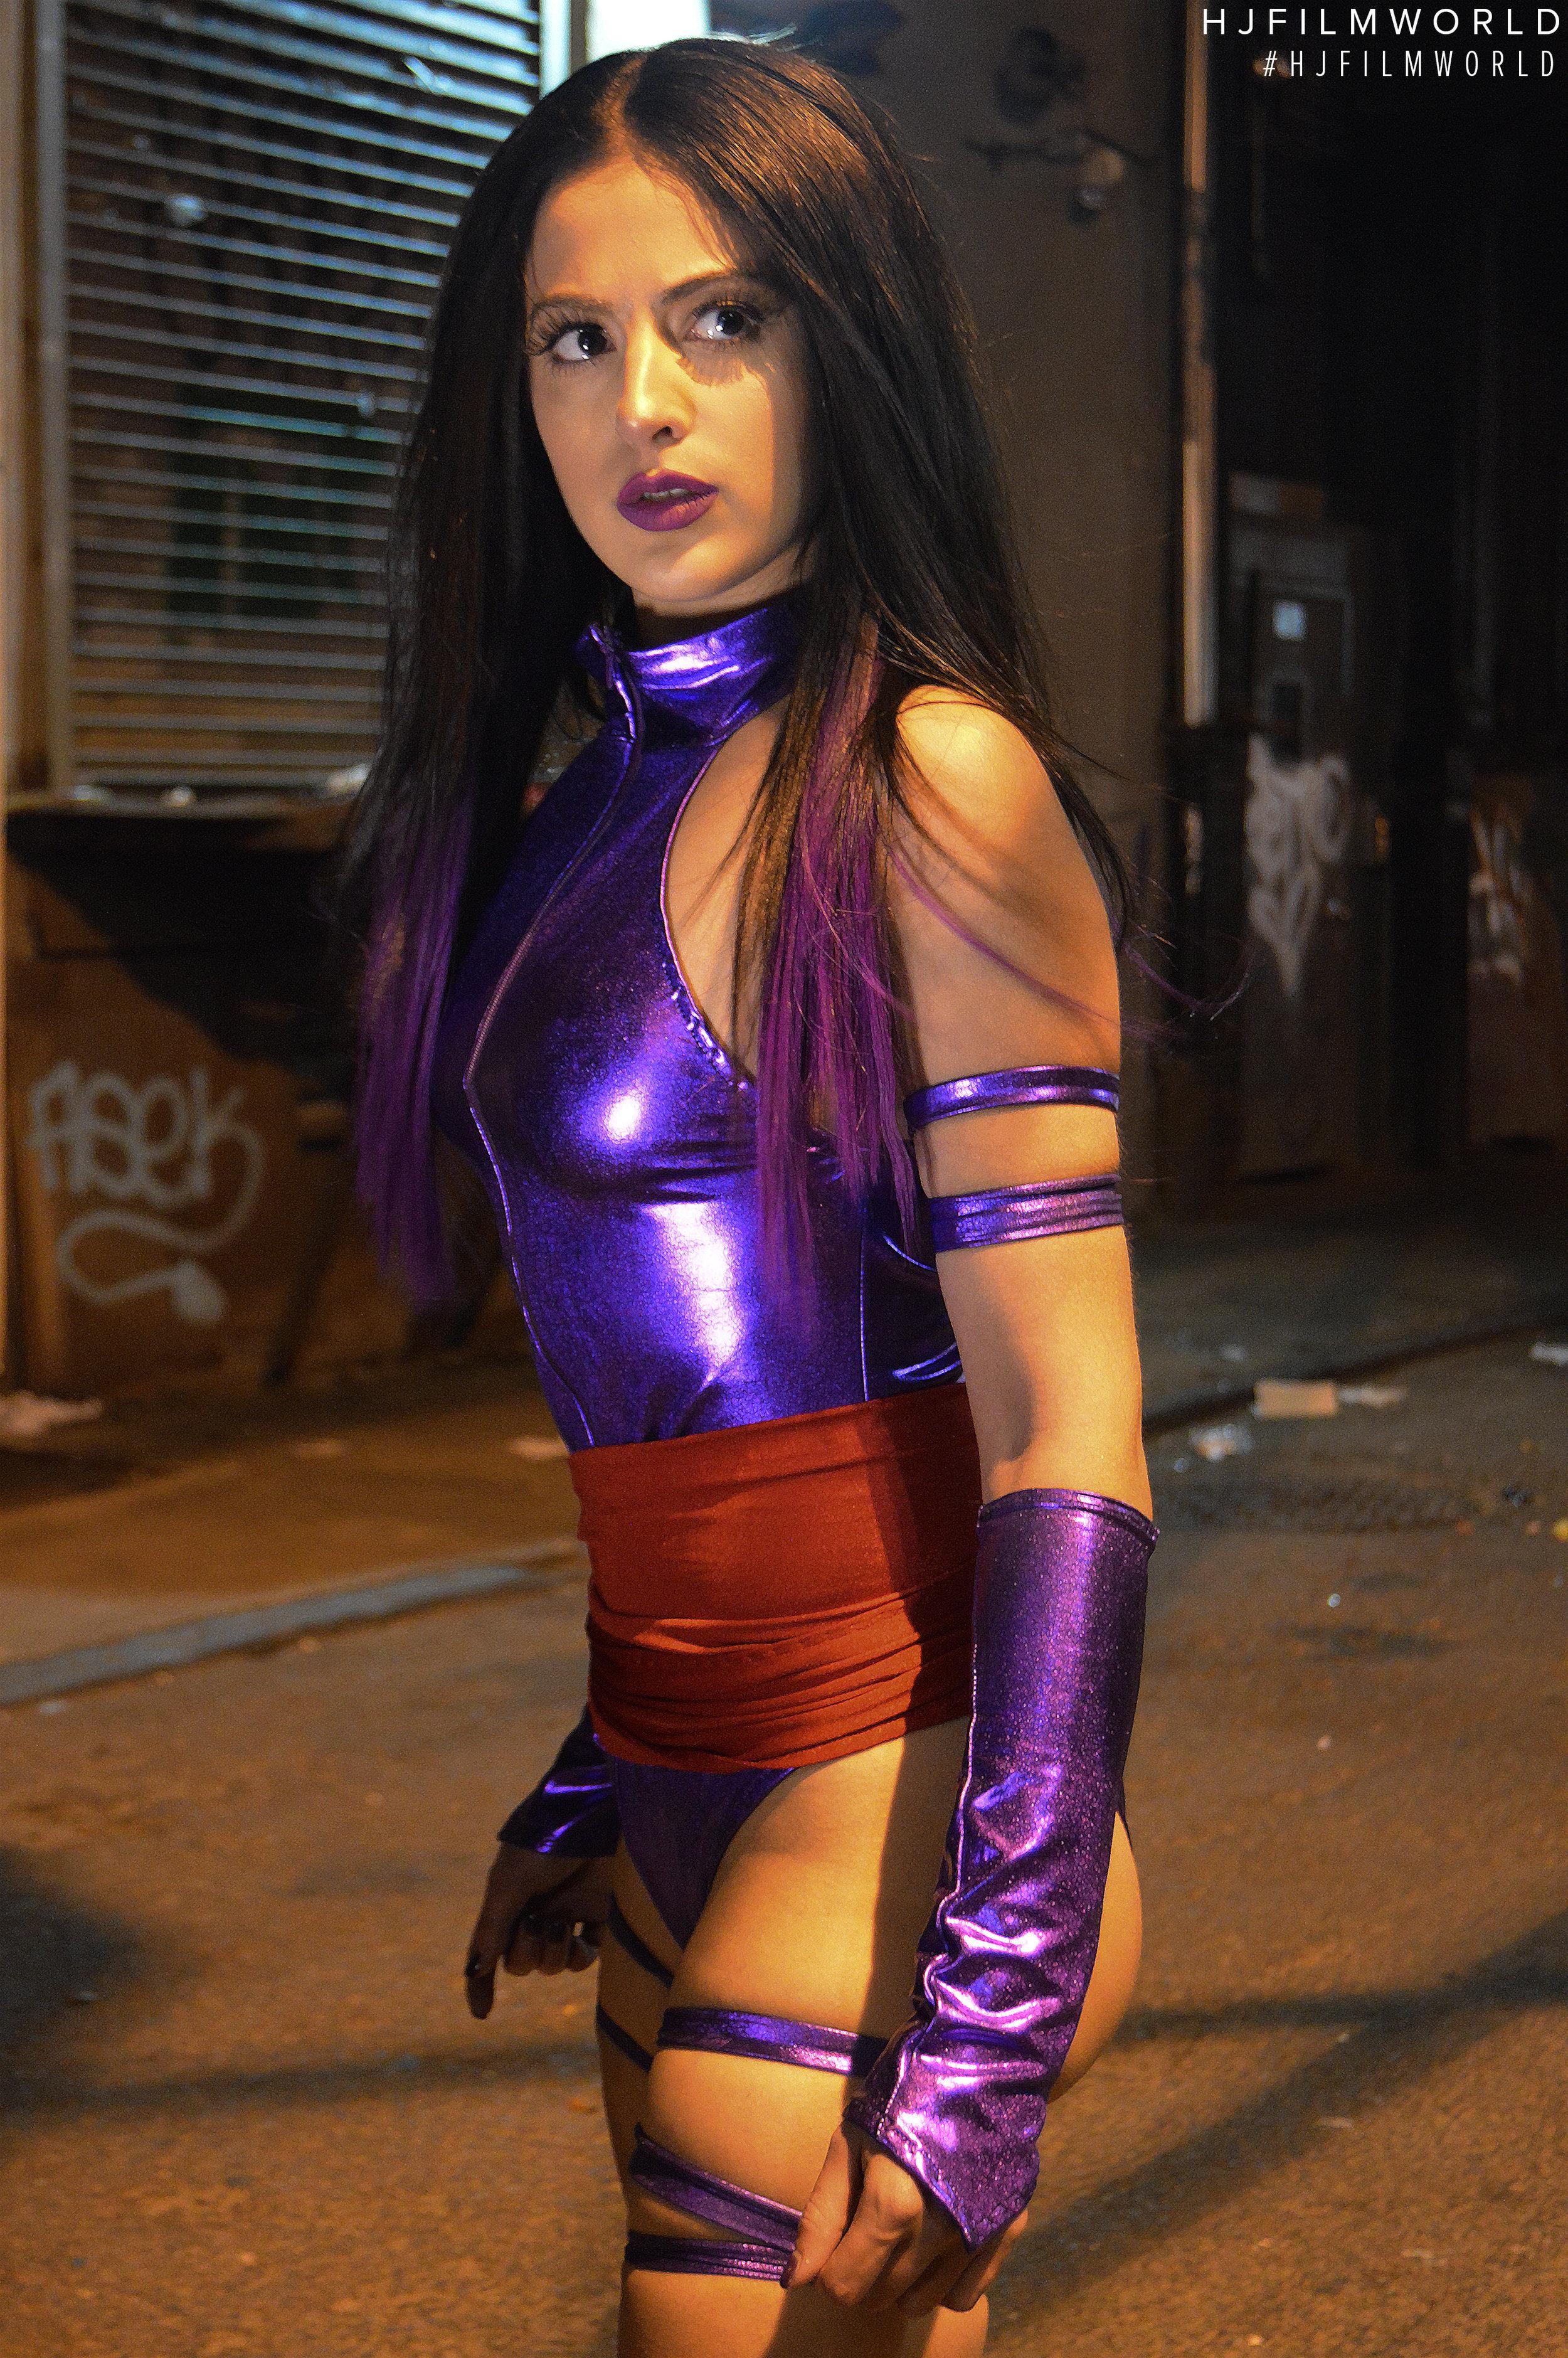 Model: Ariana Chavez